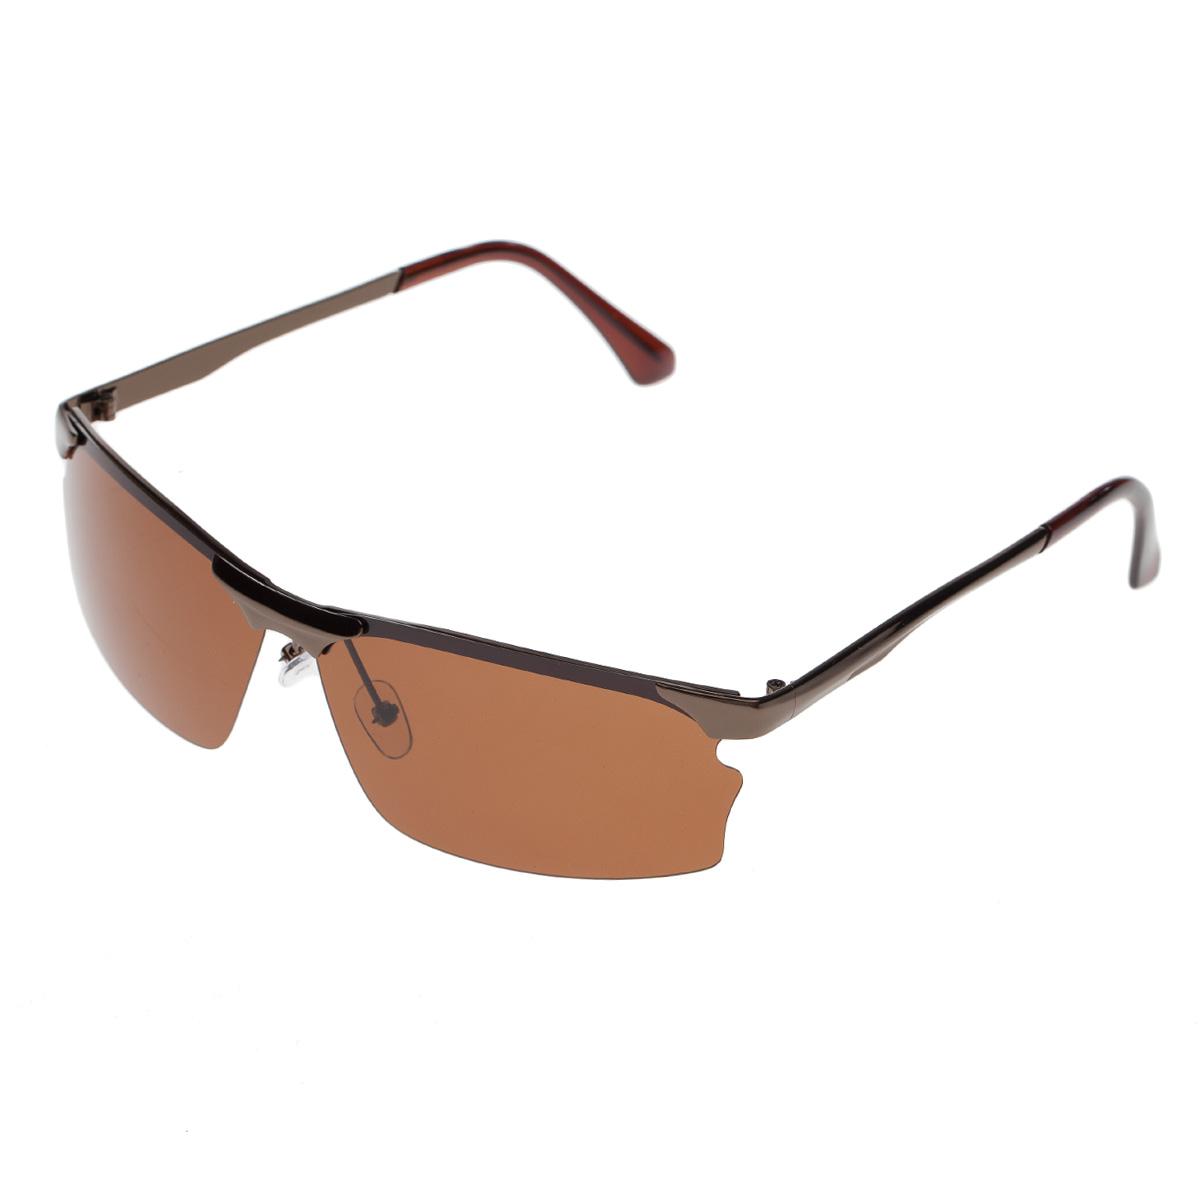 Фото - Очки солнцезащитные Sevenext, 23032-23 очки солнцезащитные sevenext 23032 28